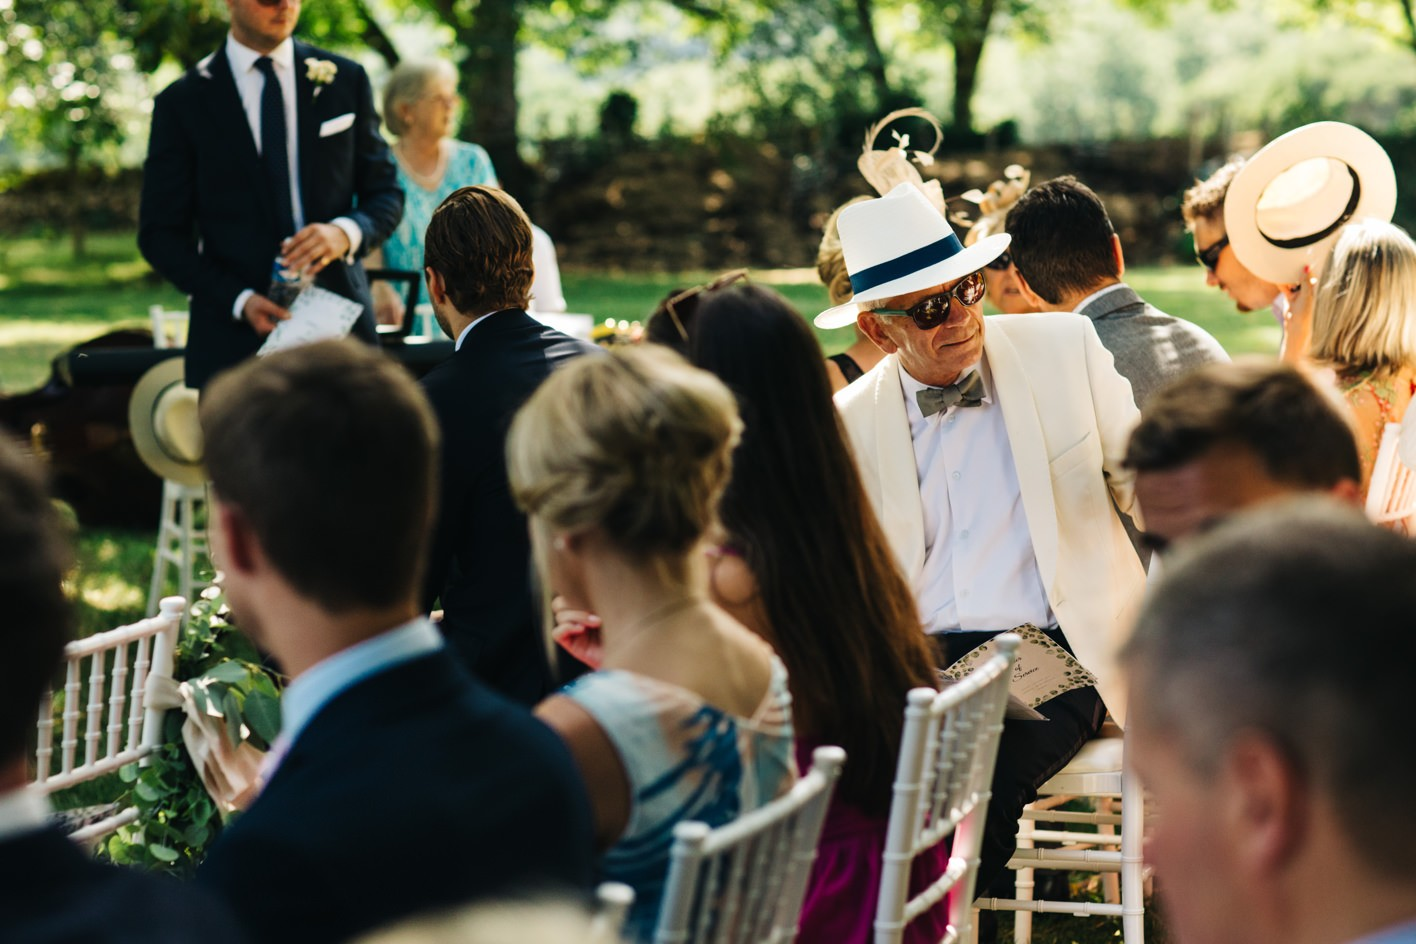 wedding guest sees bride walk down aisle